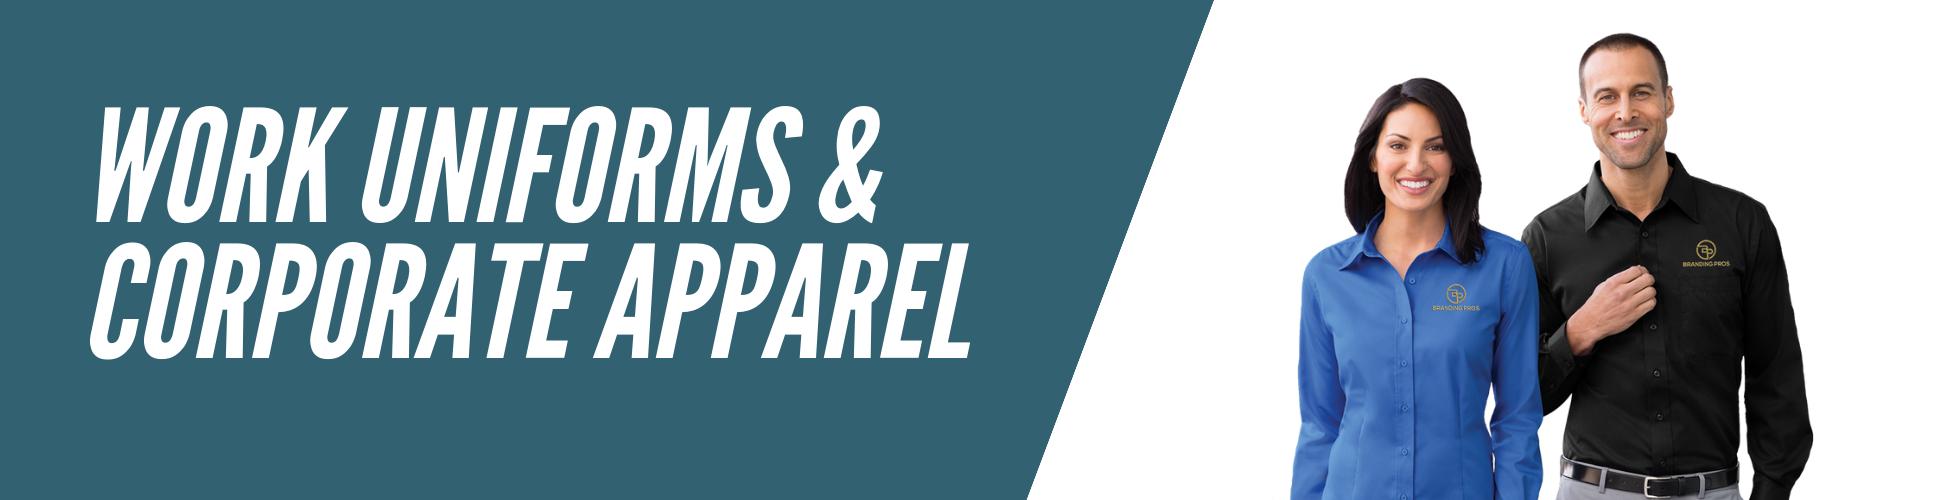 work-uniforms-corporate-apparel-banner-v3.png